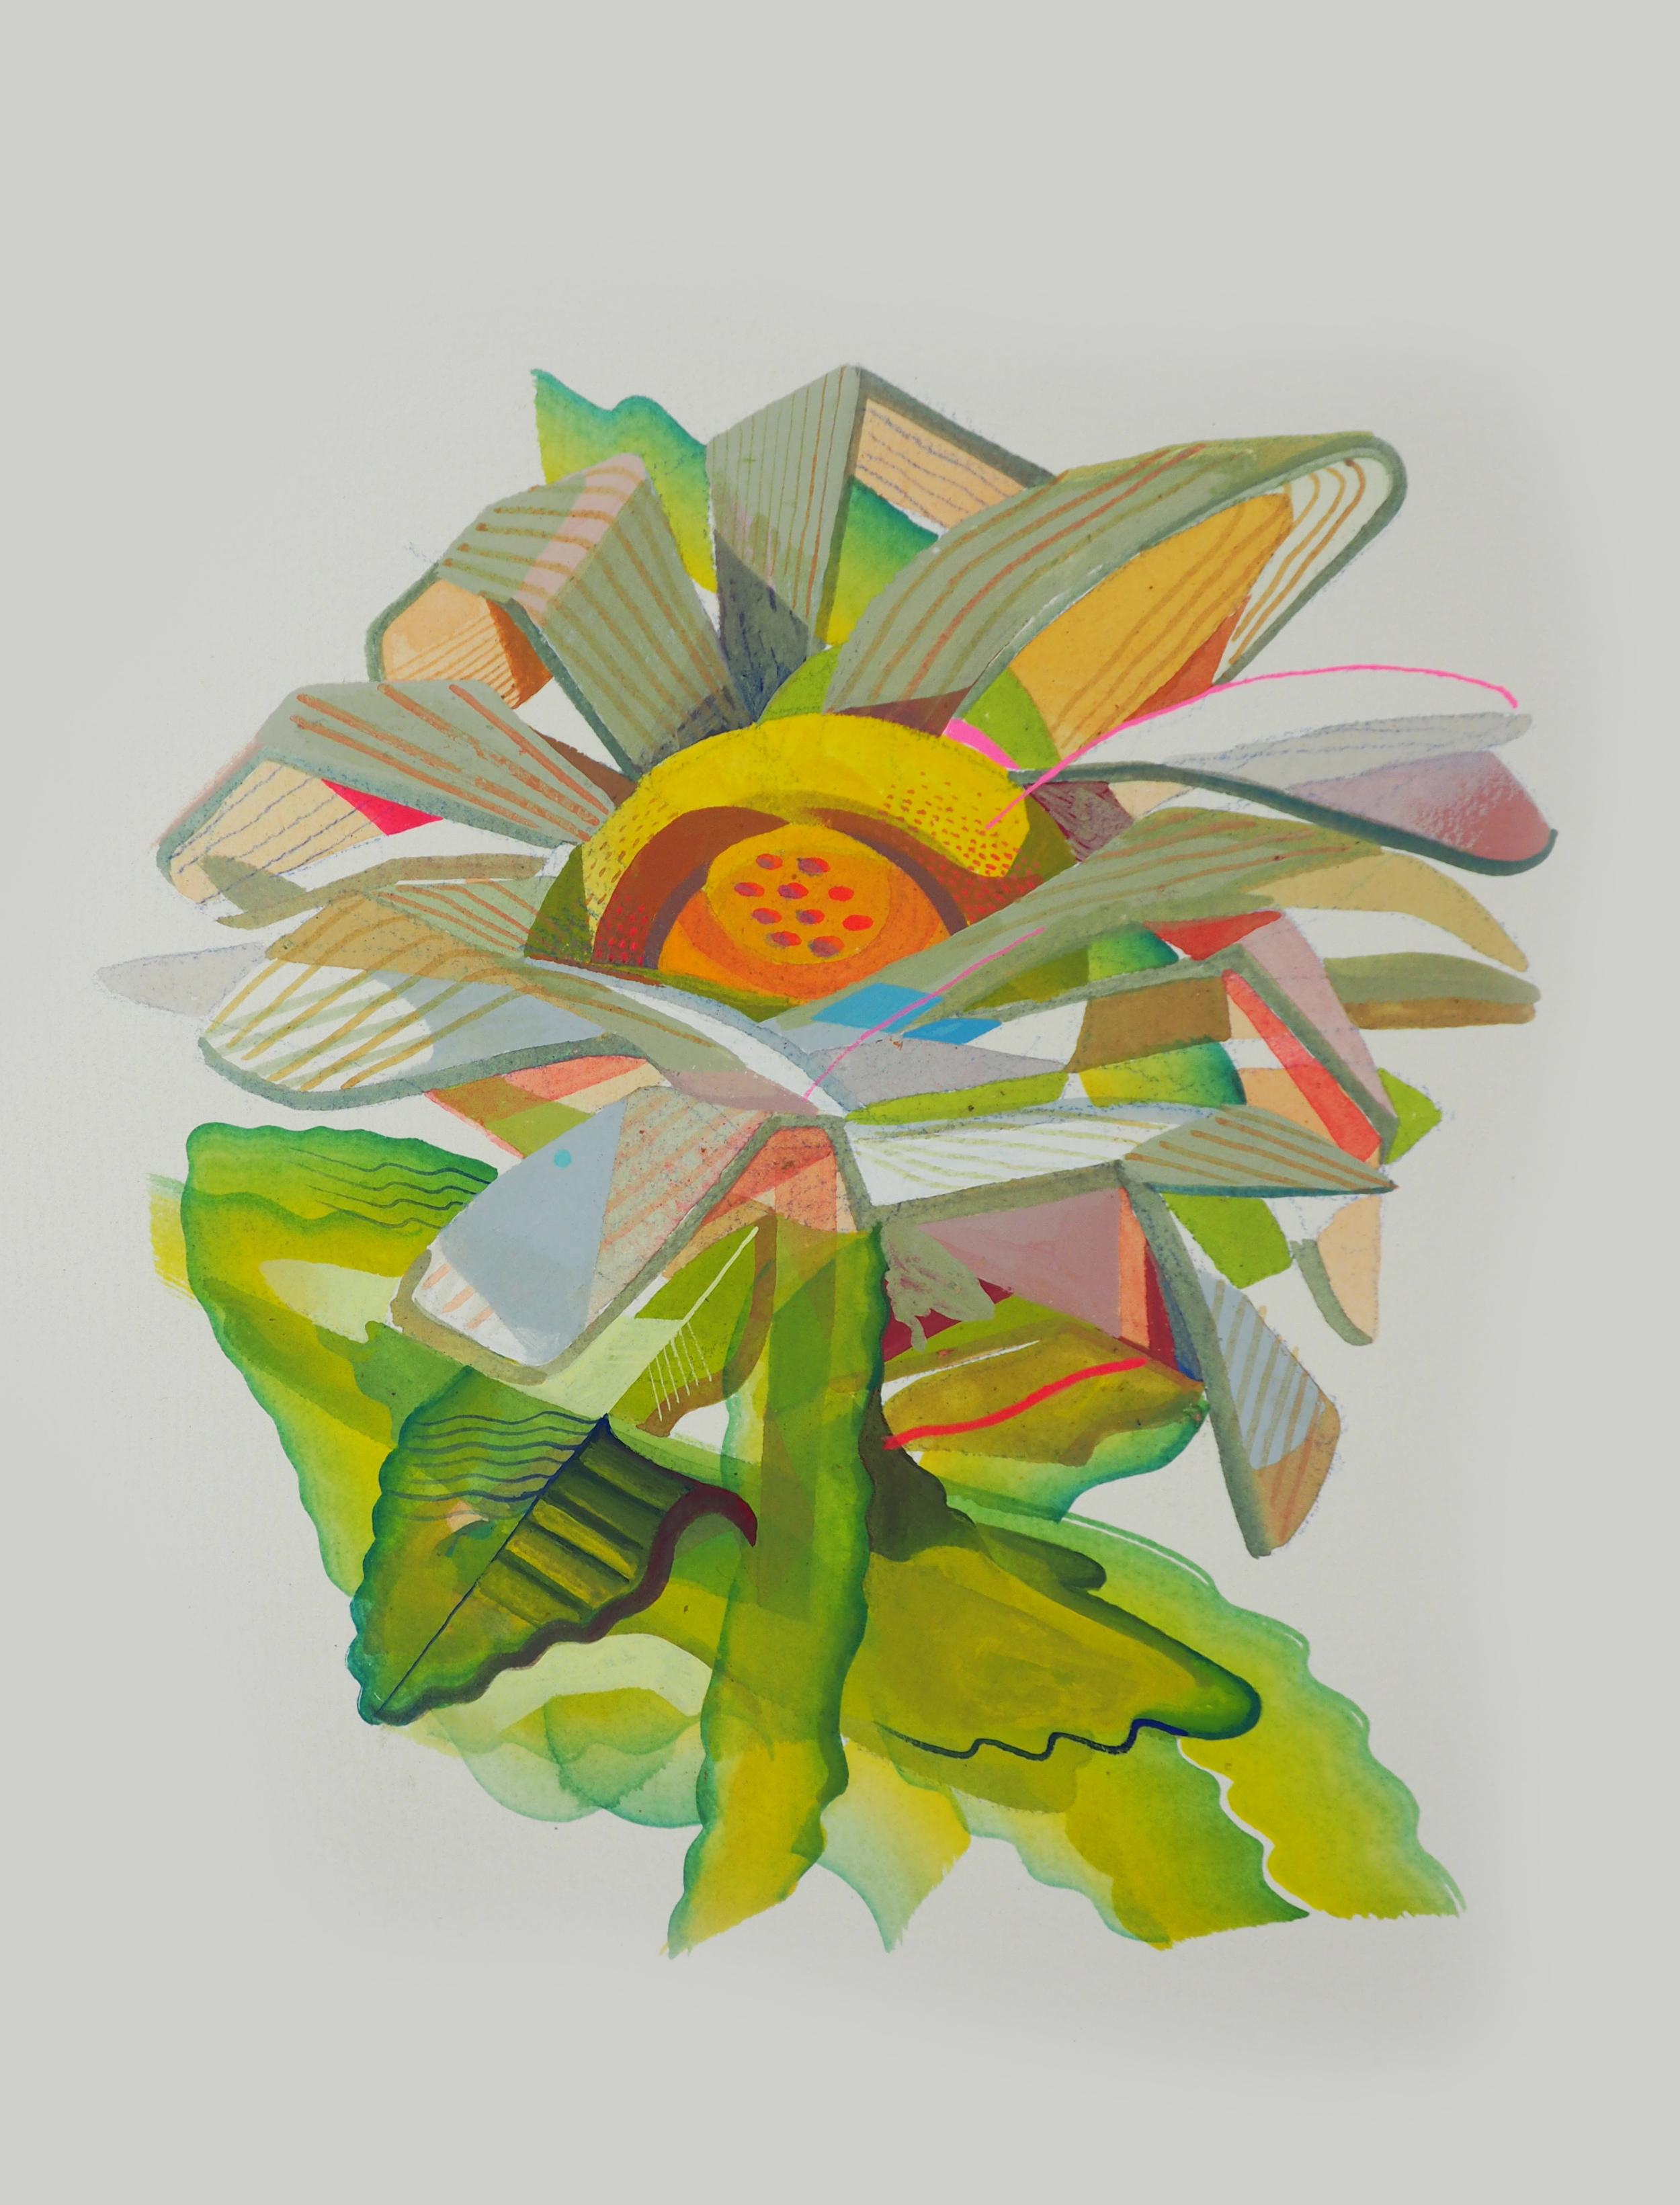 DAI , 2016 [private collection Tel Aviv, Israel] Gouache, Watercolor on Arches 300 lb. 10 x 8 in.